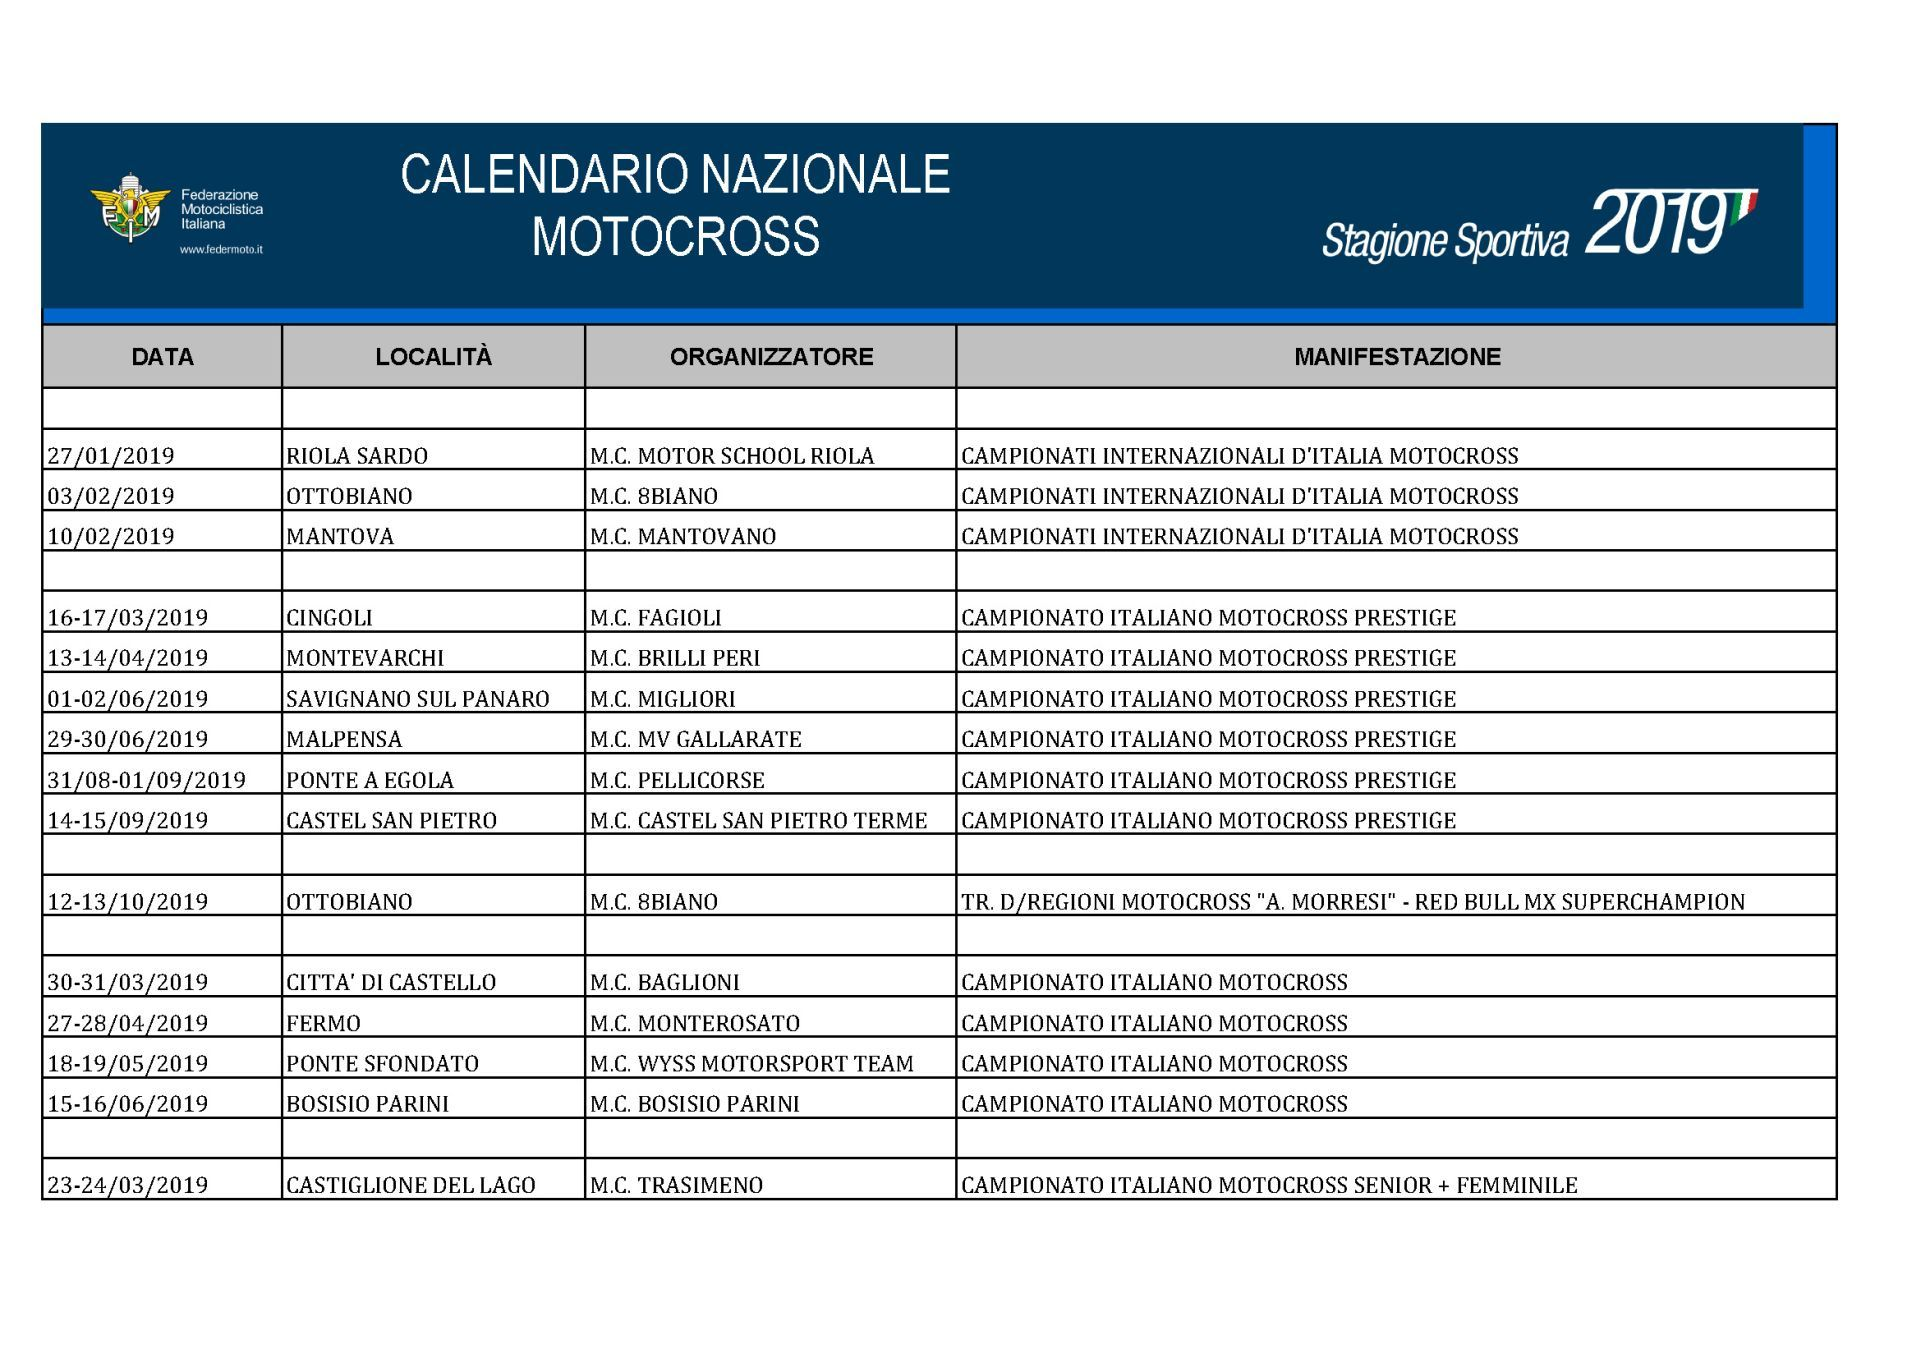 Calendario Castelletto Di Branduzzo.Calendario 2019 Italiano Motocross Supermoto E Motorally